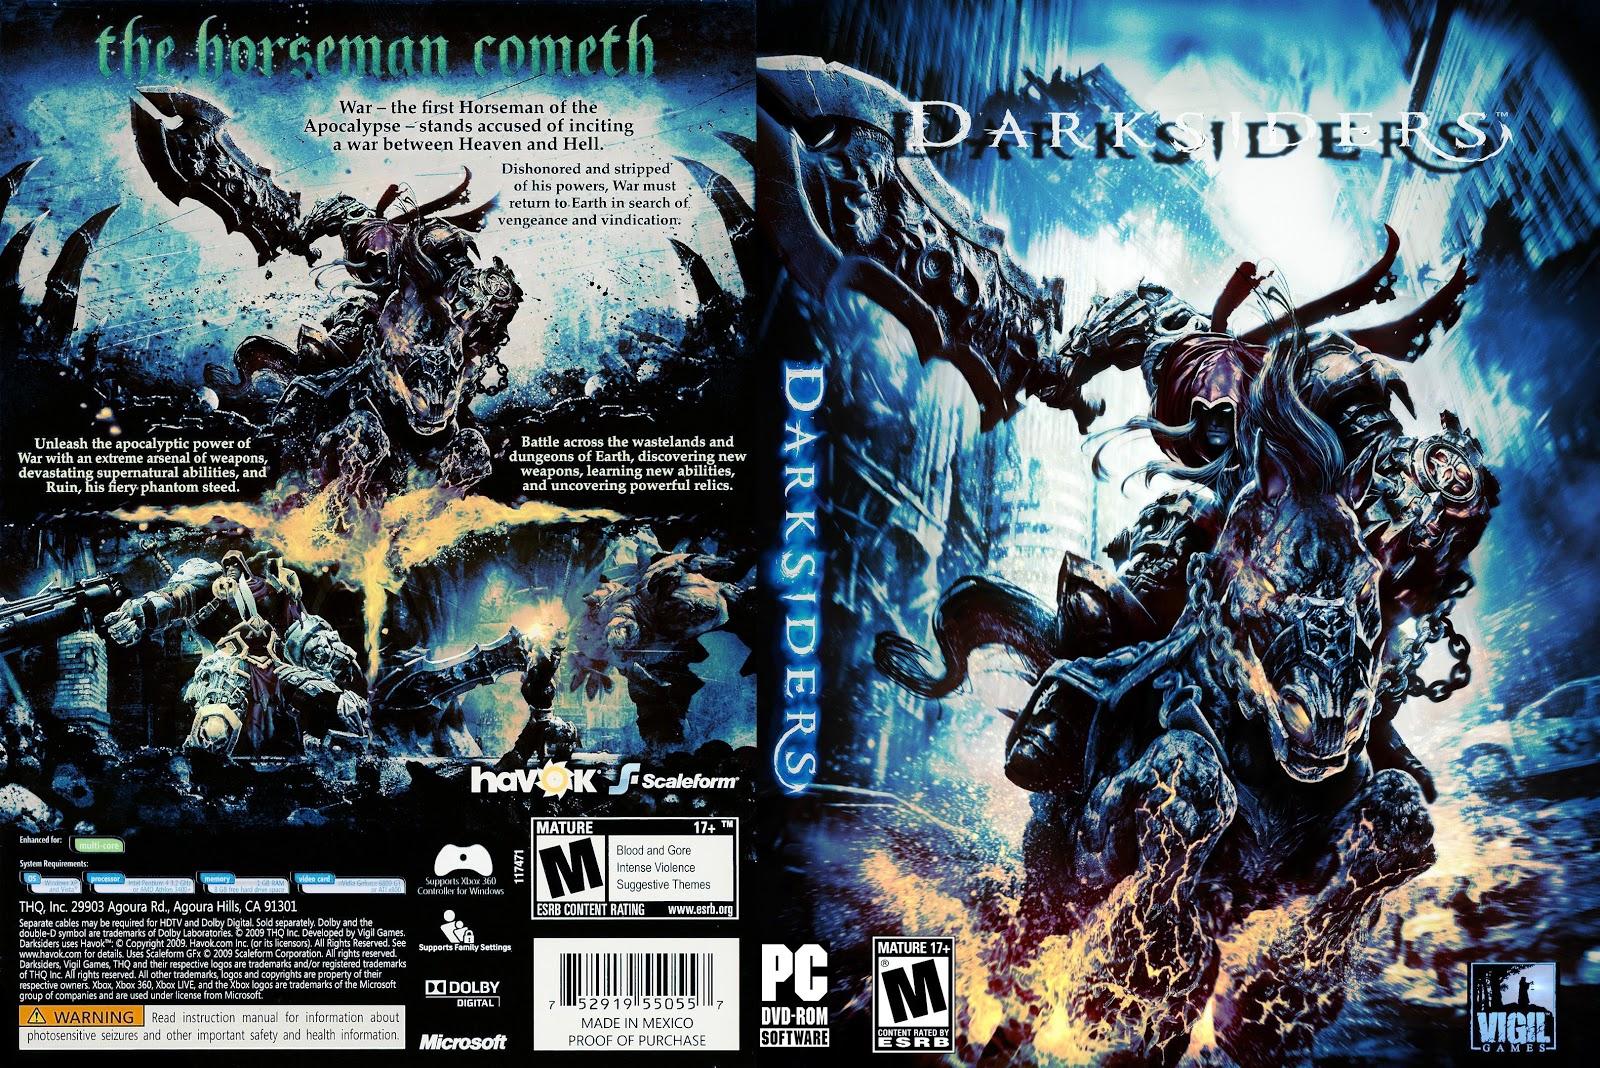 Capa Darksiders PC